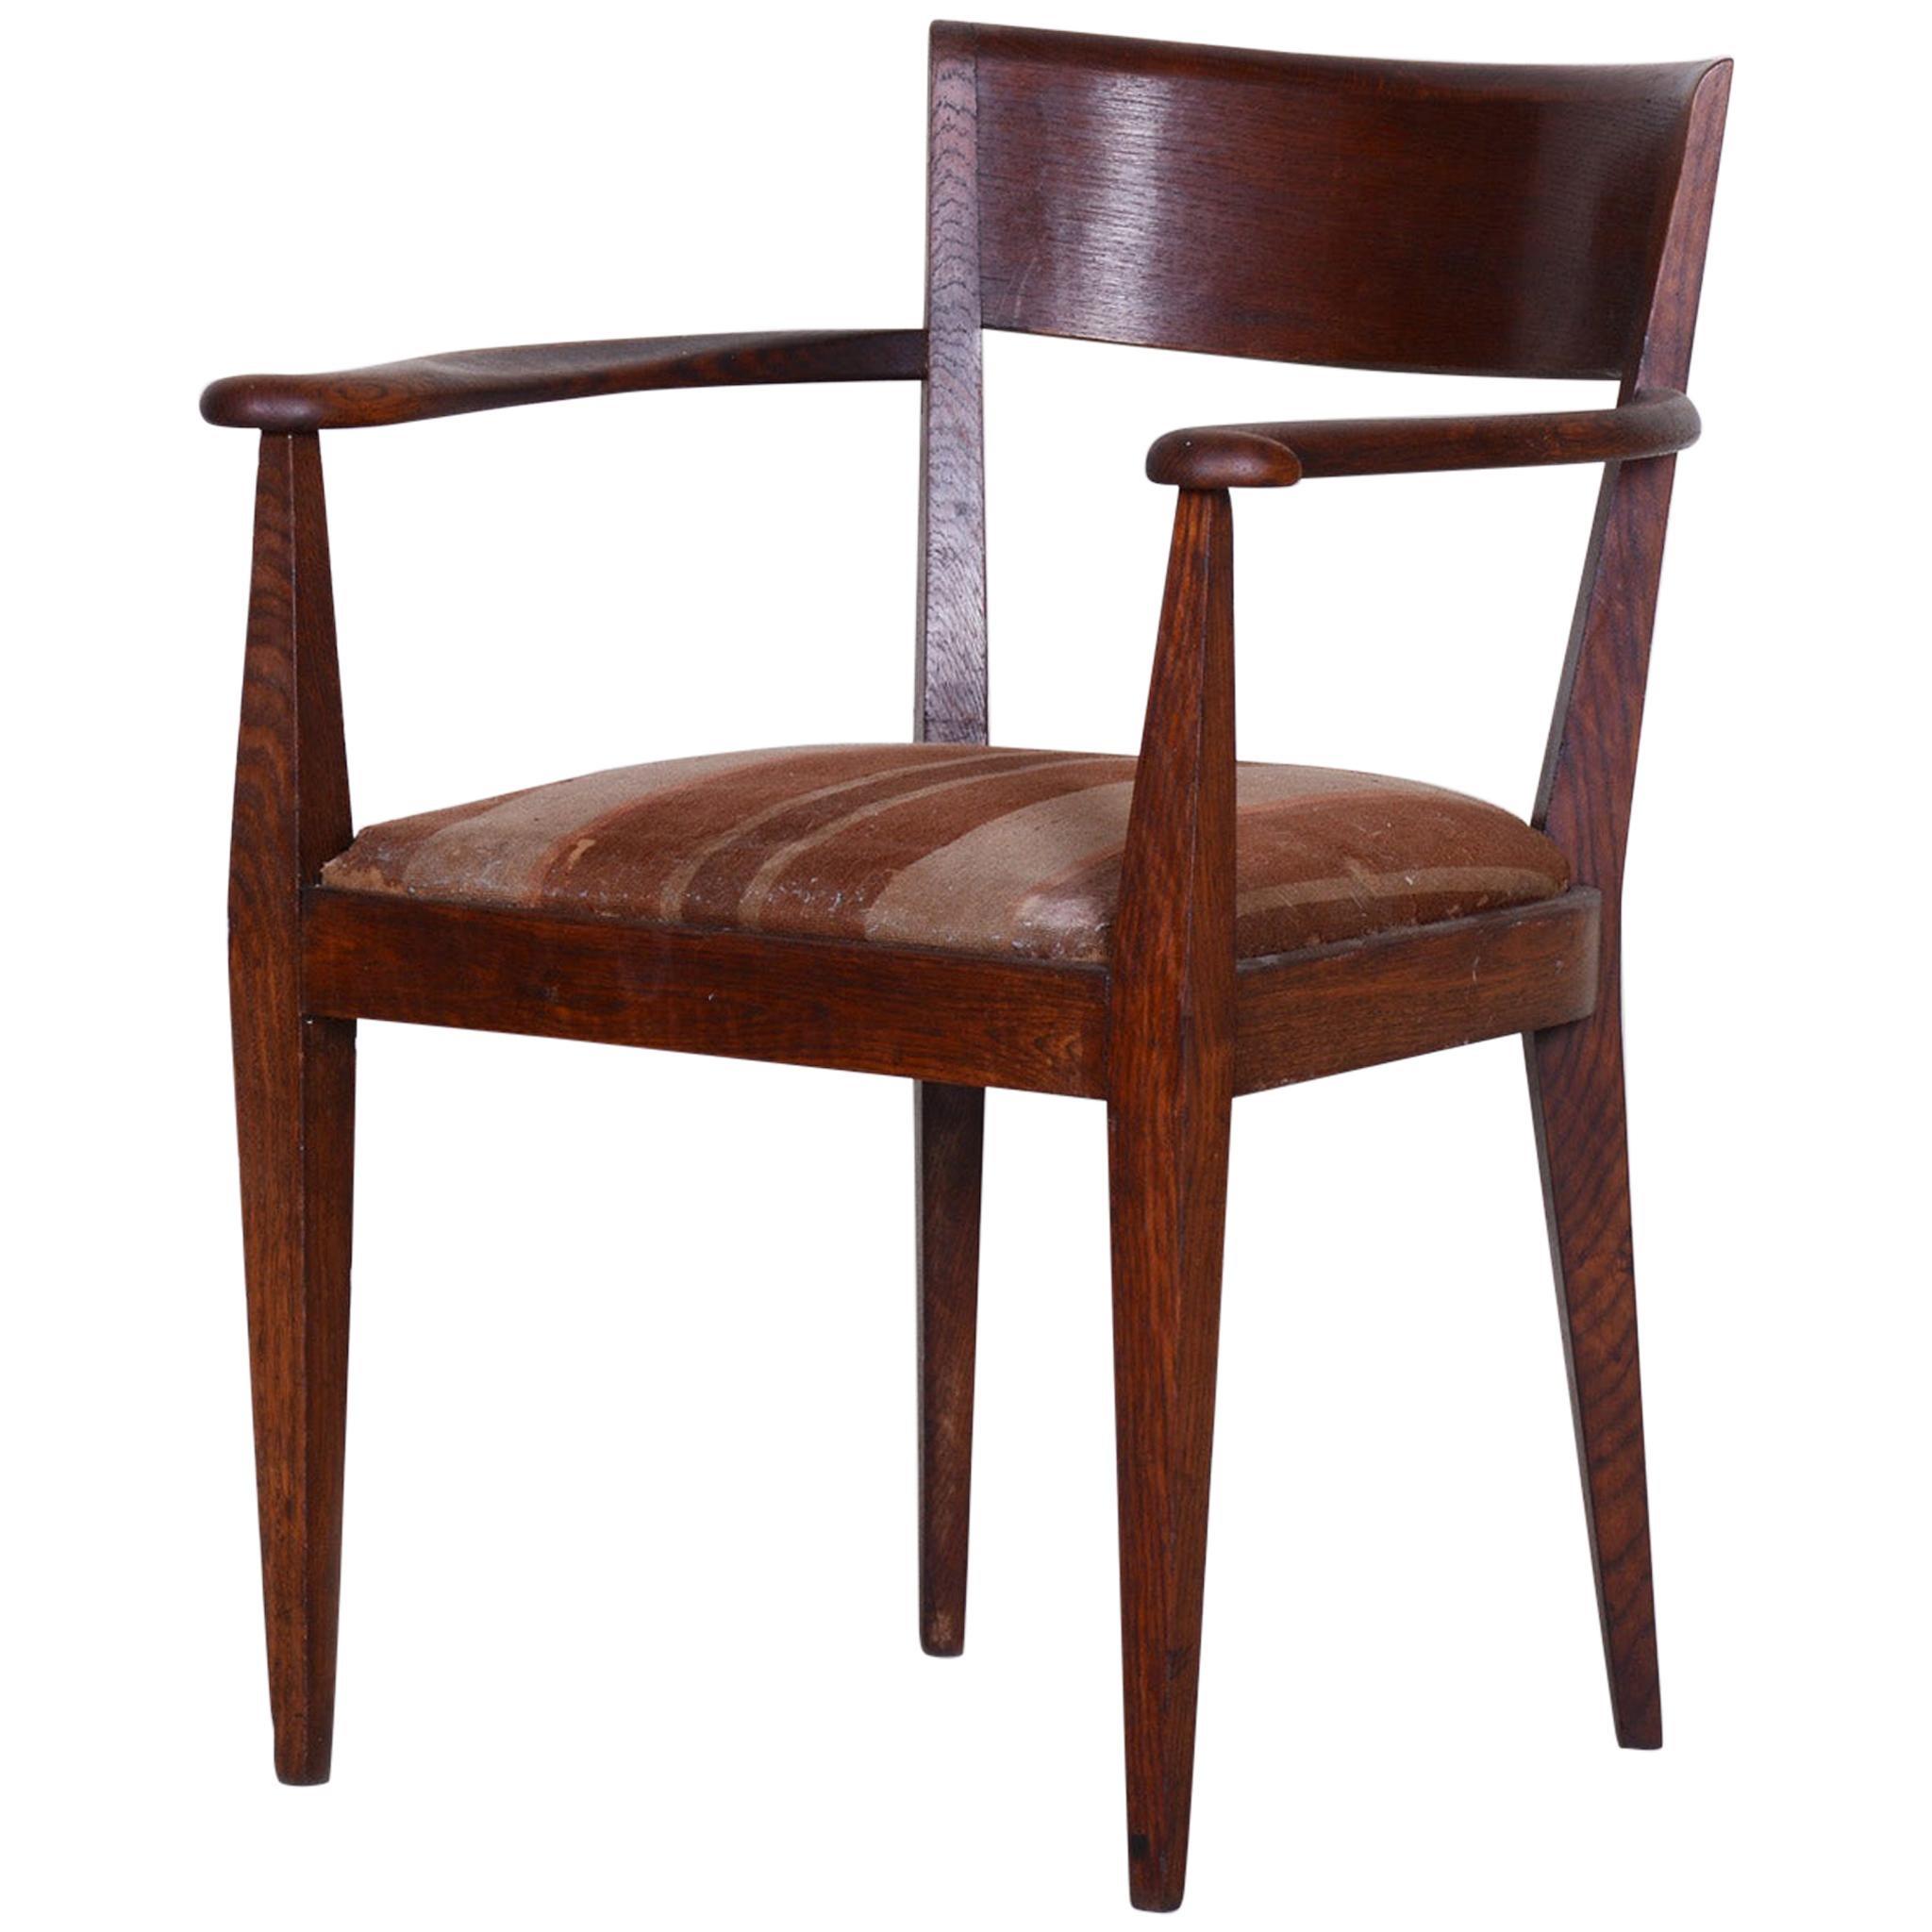 Brown Oak Cubist Art Deco Armchair, Original Well Preserved Condition, 1920s